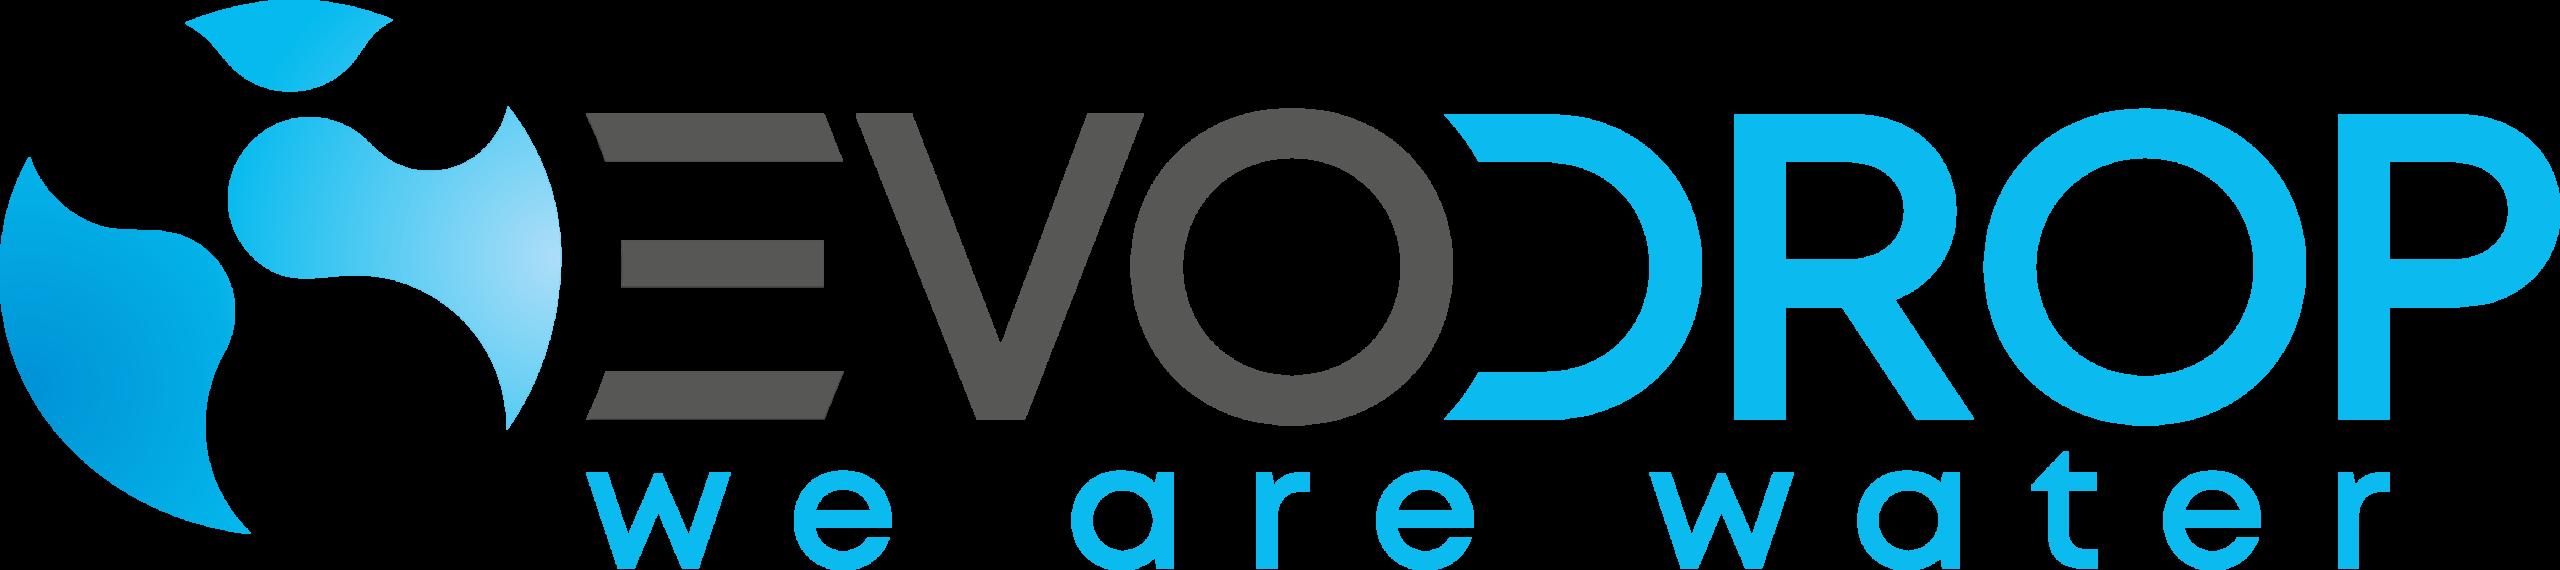 Evodrop Logo